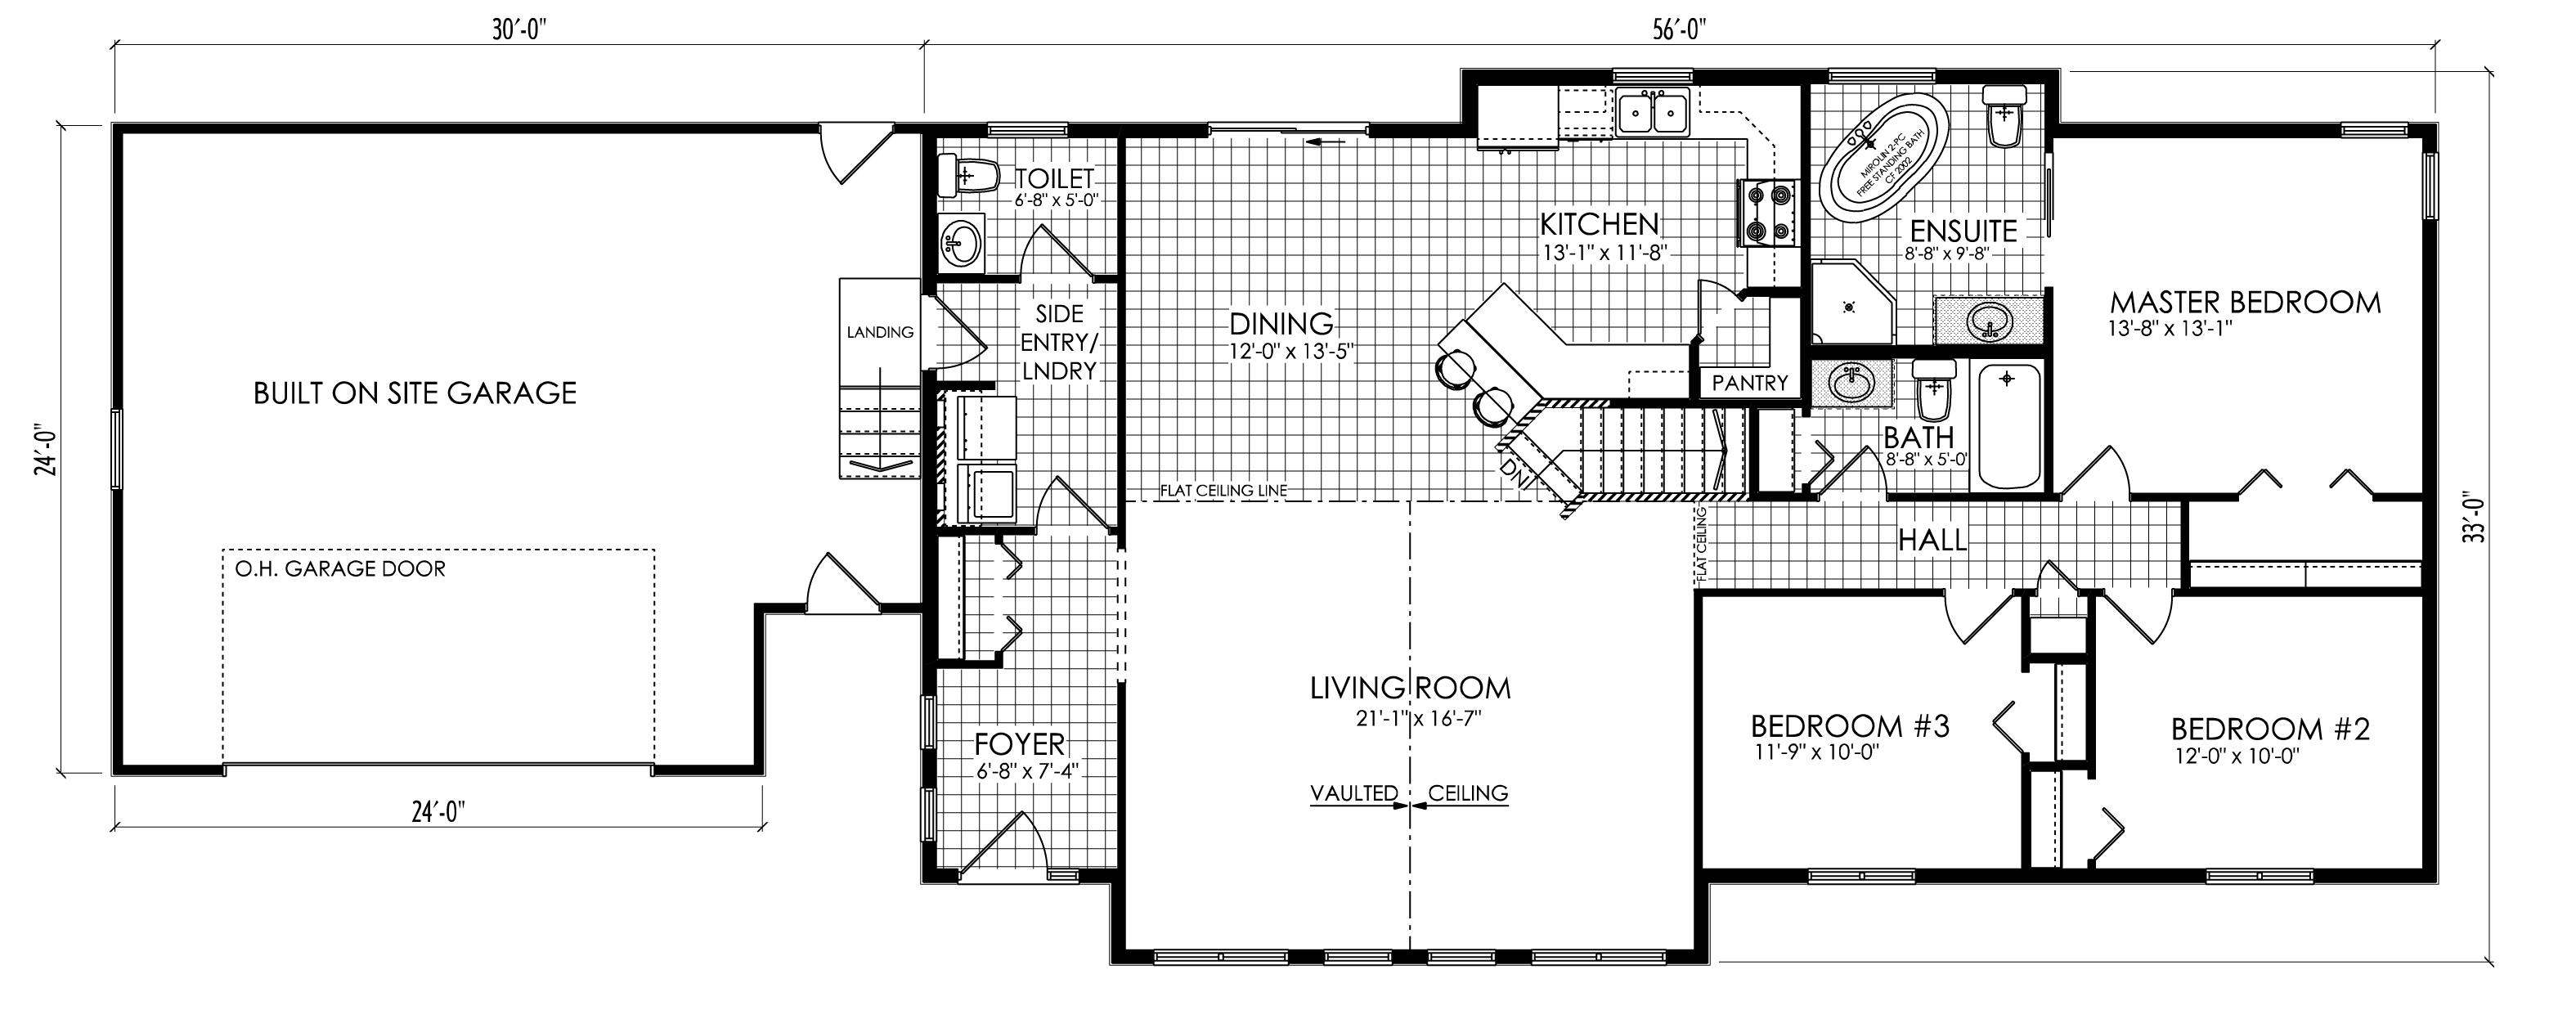 CATALINA with Garage_Floorplan